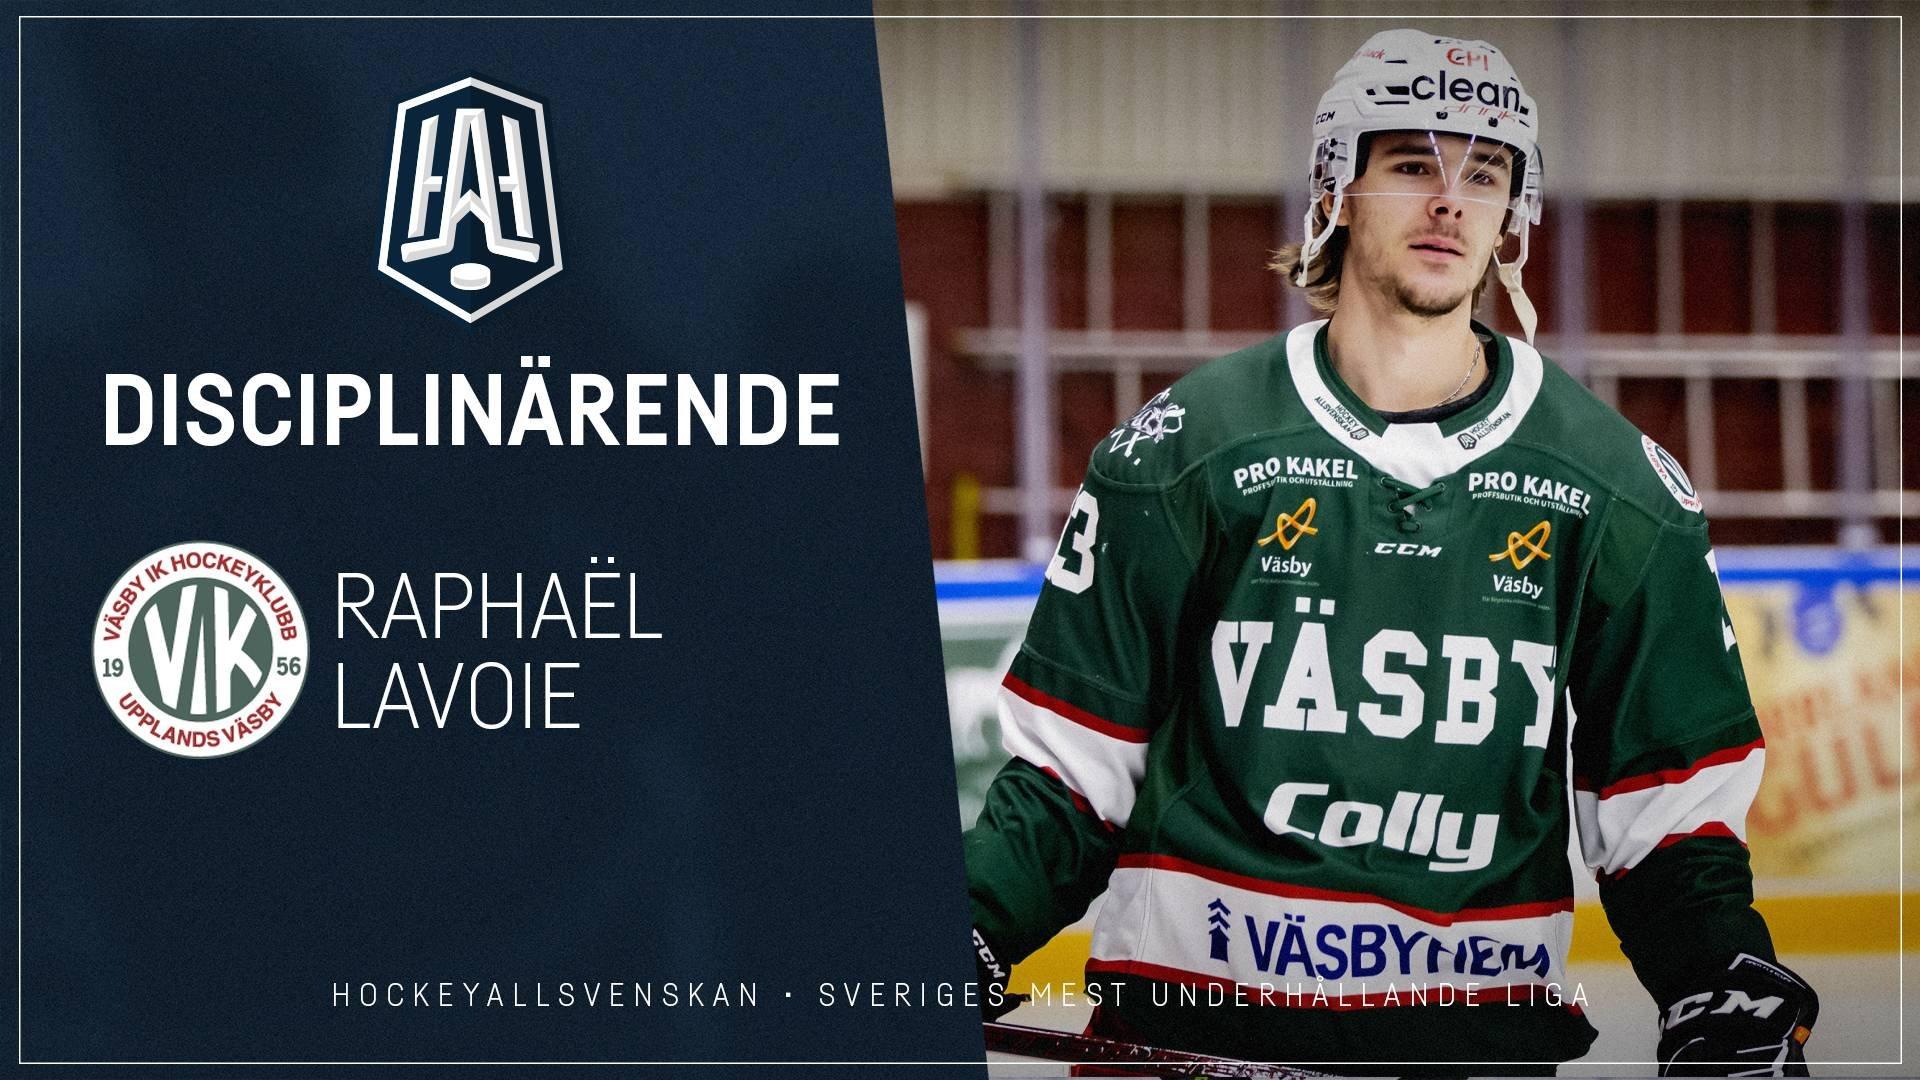 Disciplinärende: Raphaël Lavoie, Väsby